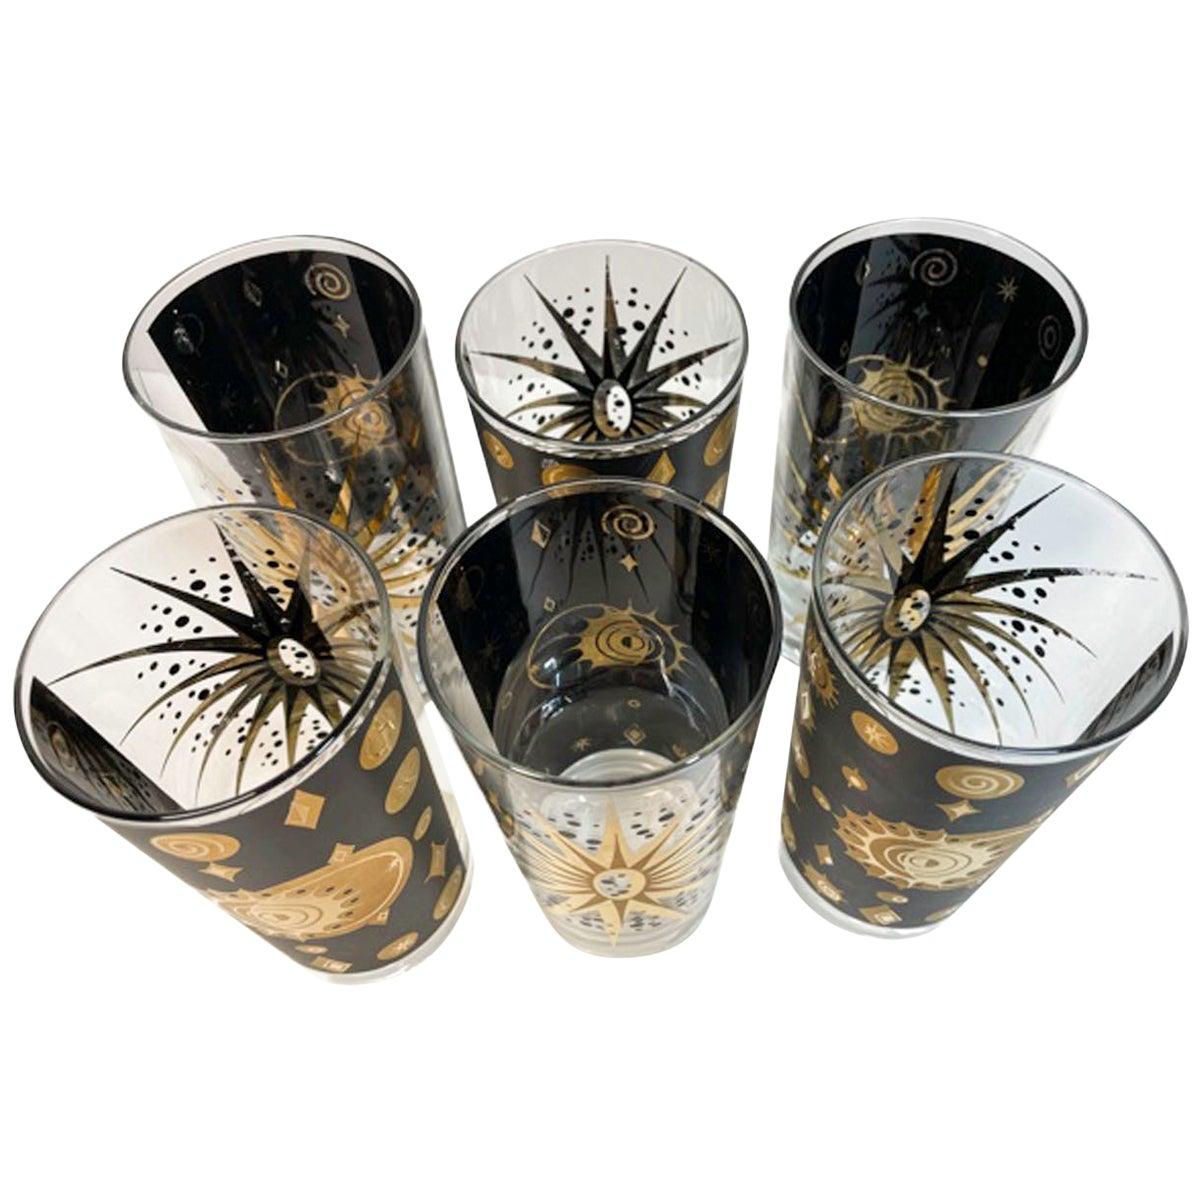 "Vintage Fred Press ""Eclipse"" Highball Glasses in Black Enamel and 22 Karat Gold"